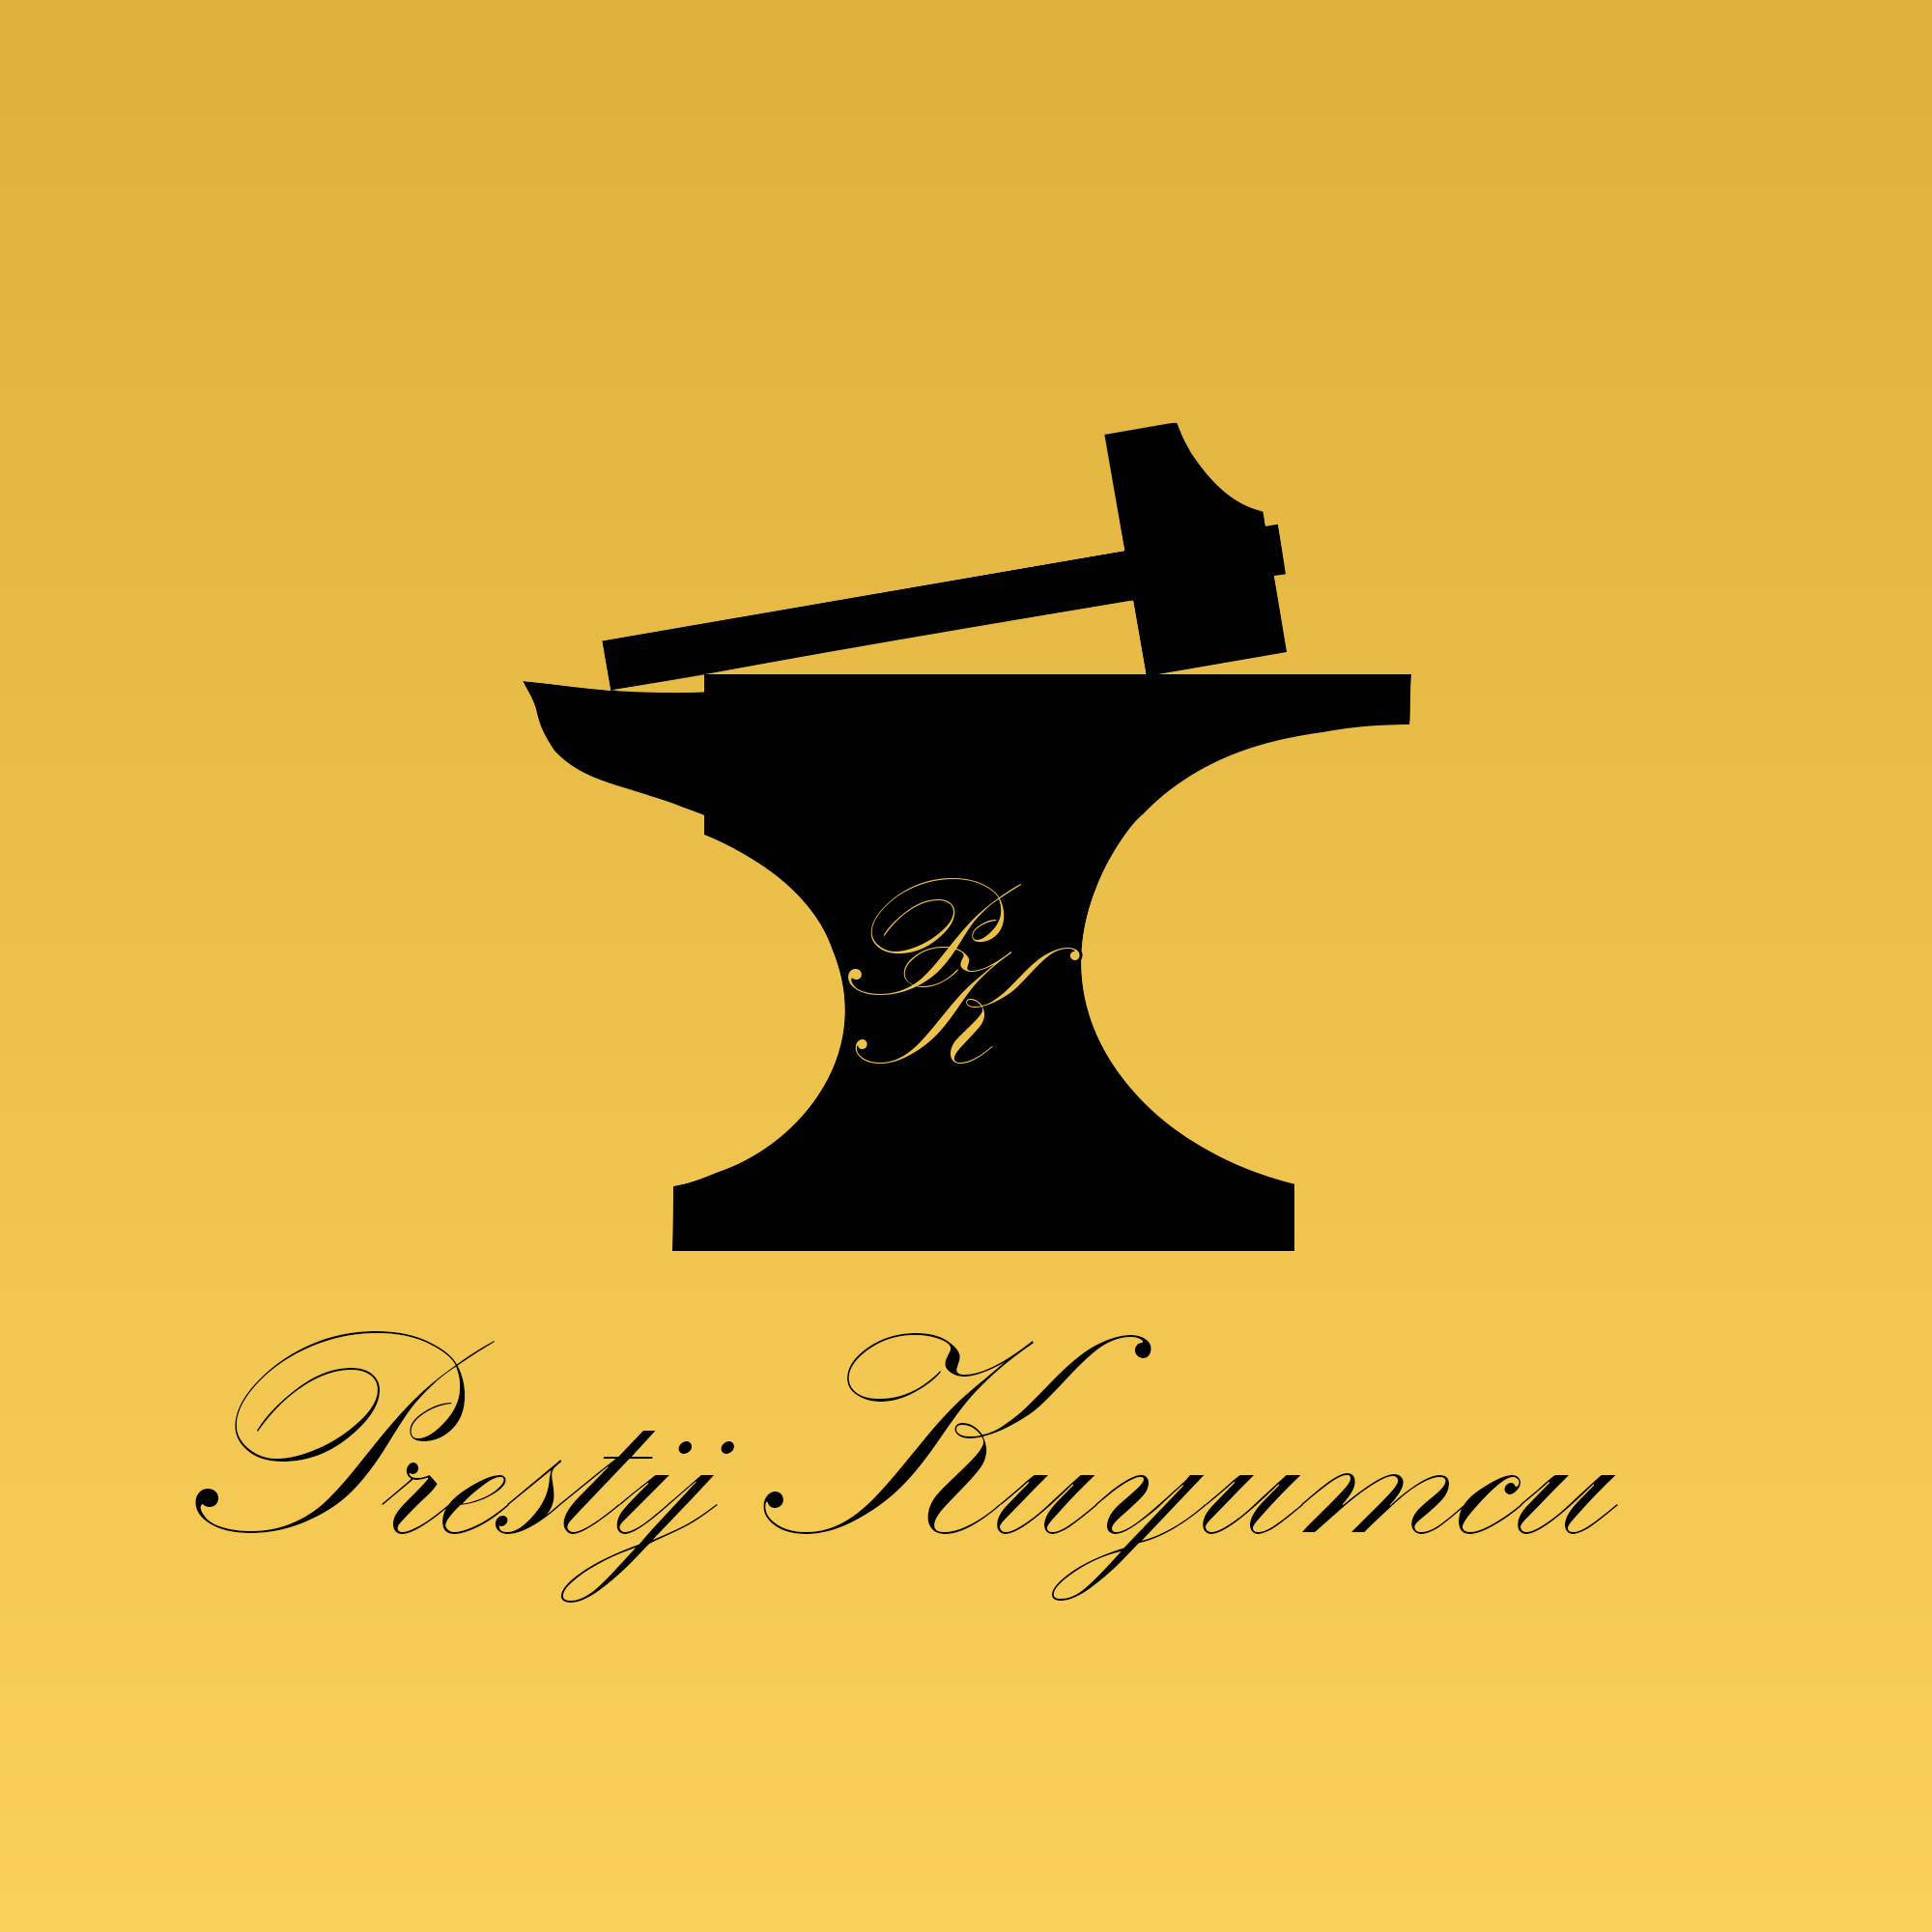 Portfolio von Ascotech Logo Prestÿ Kuyumcu